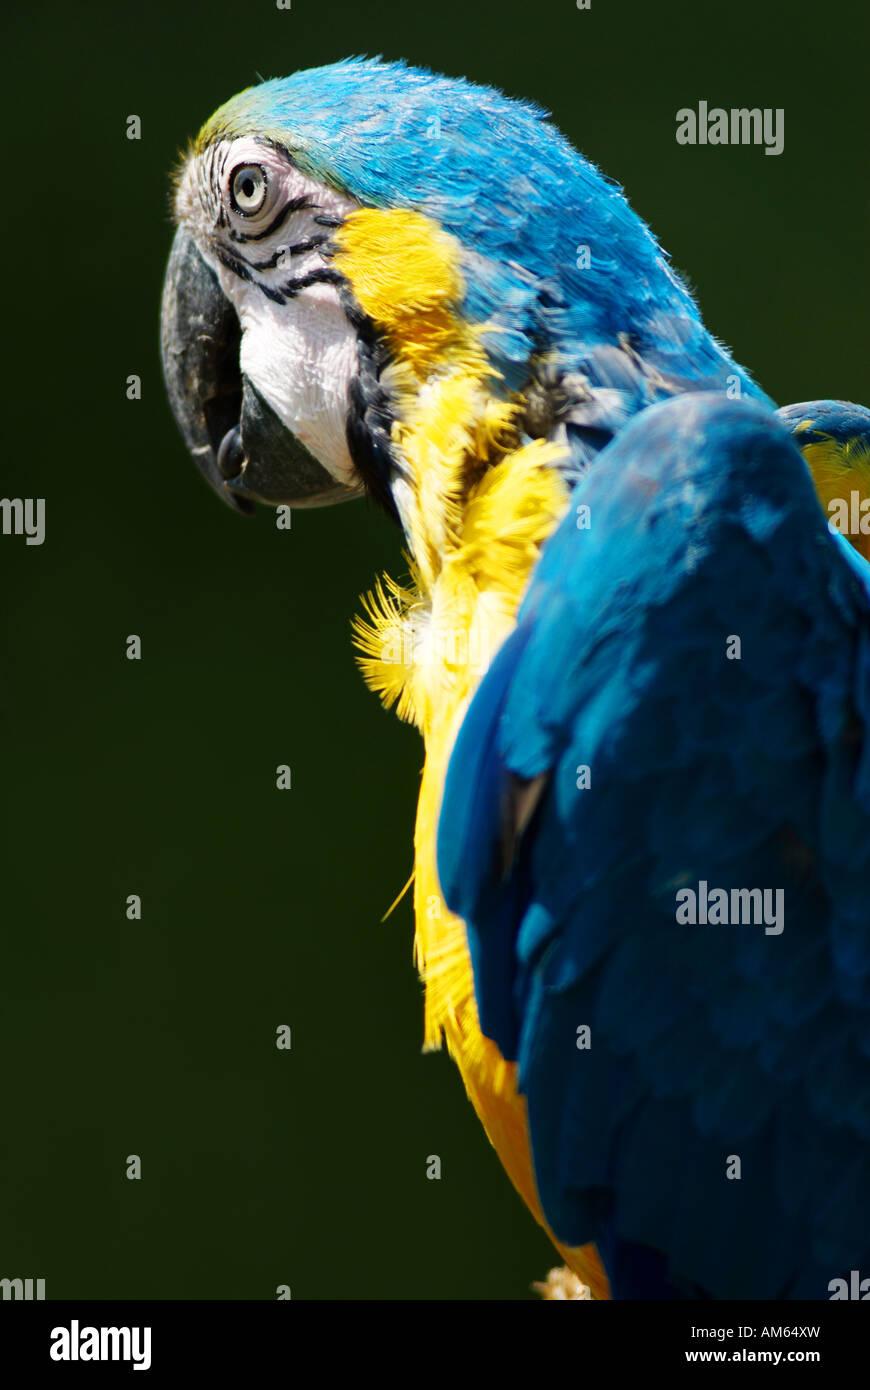 Blaue und gelbe Aras (Ara Ararauna) Stockbild